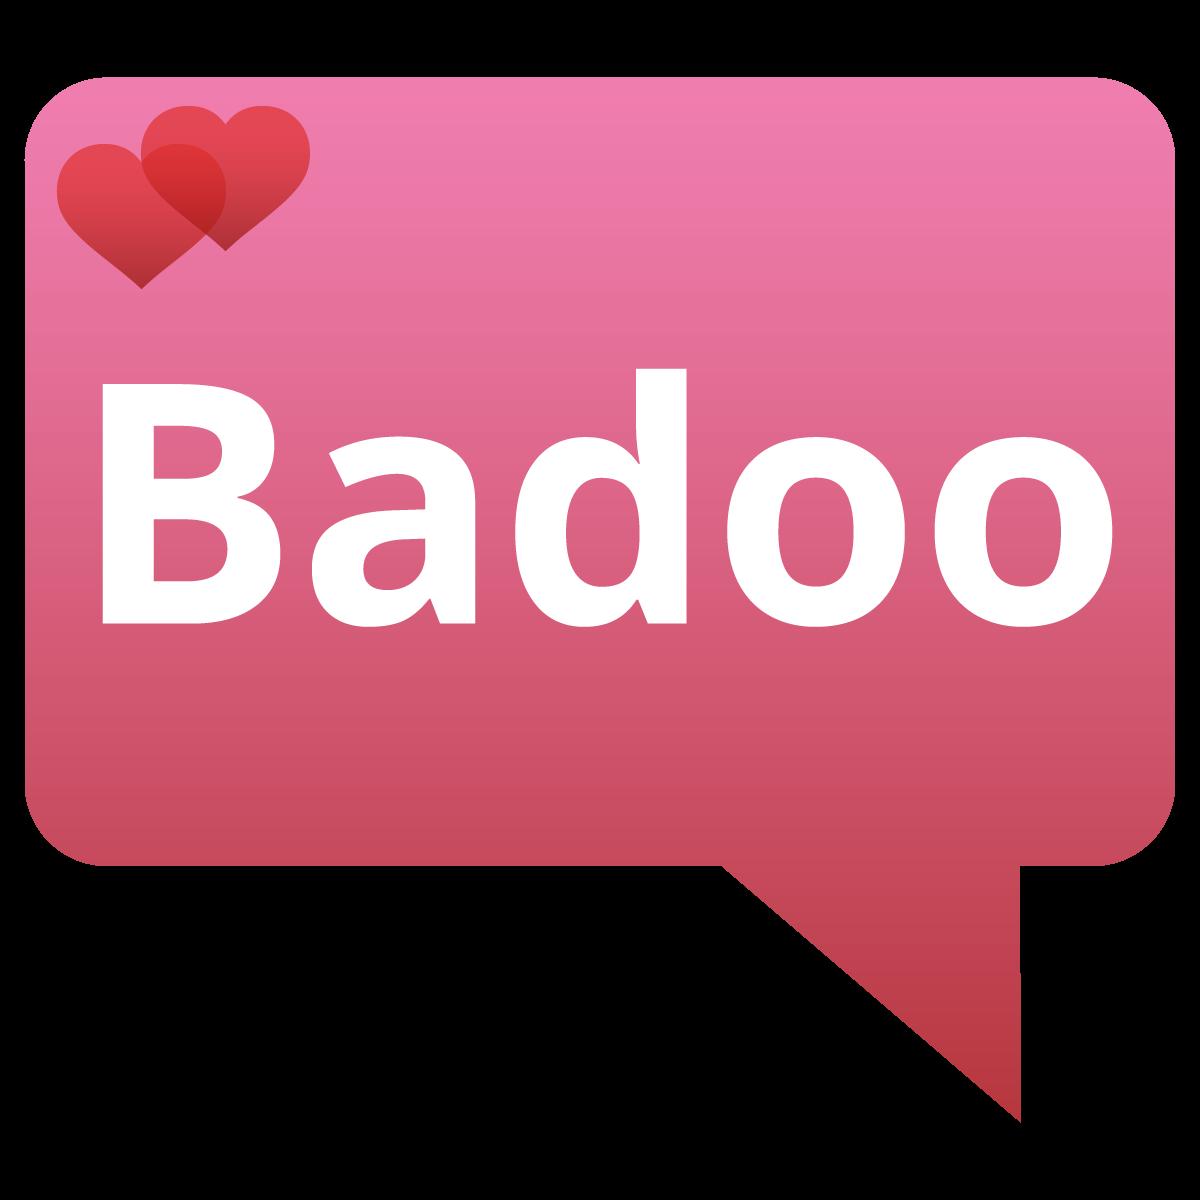 Profil verstecken badoo Reale dating